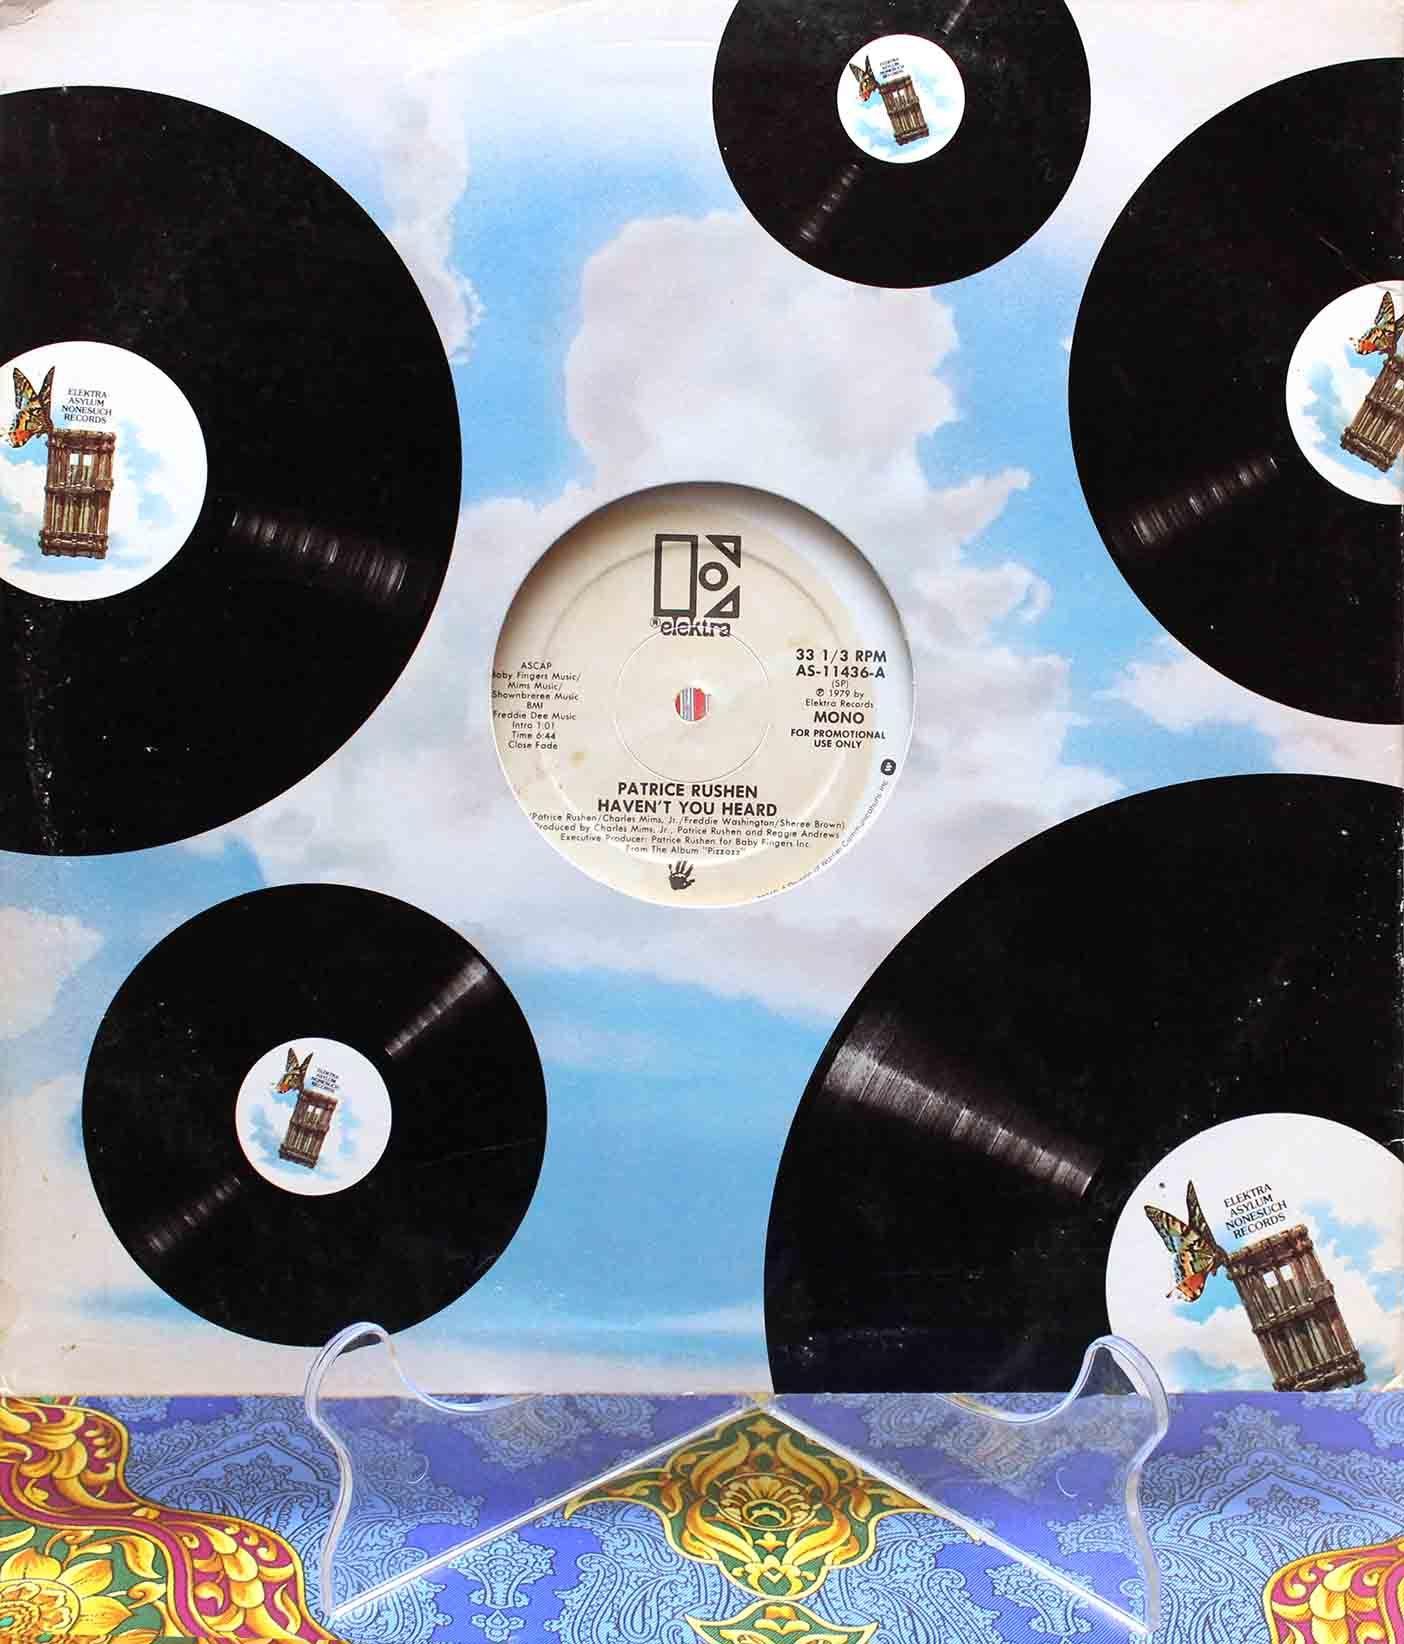 Patrice Rushen – Havent You Heard 02